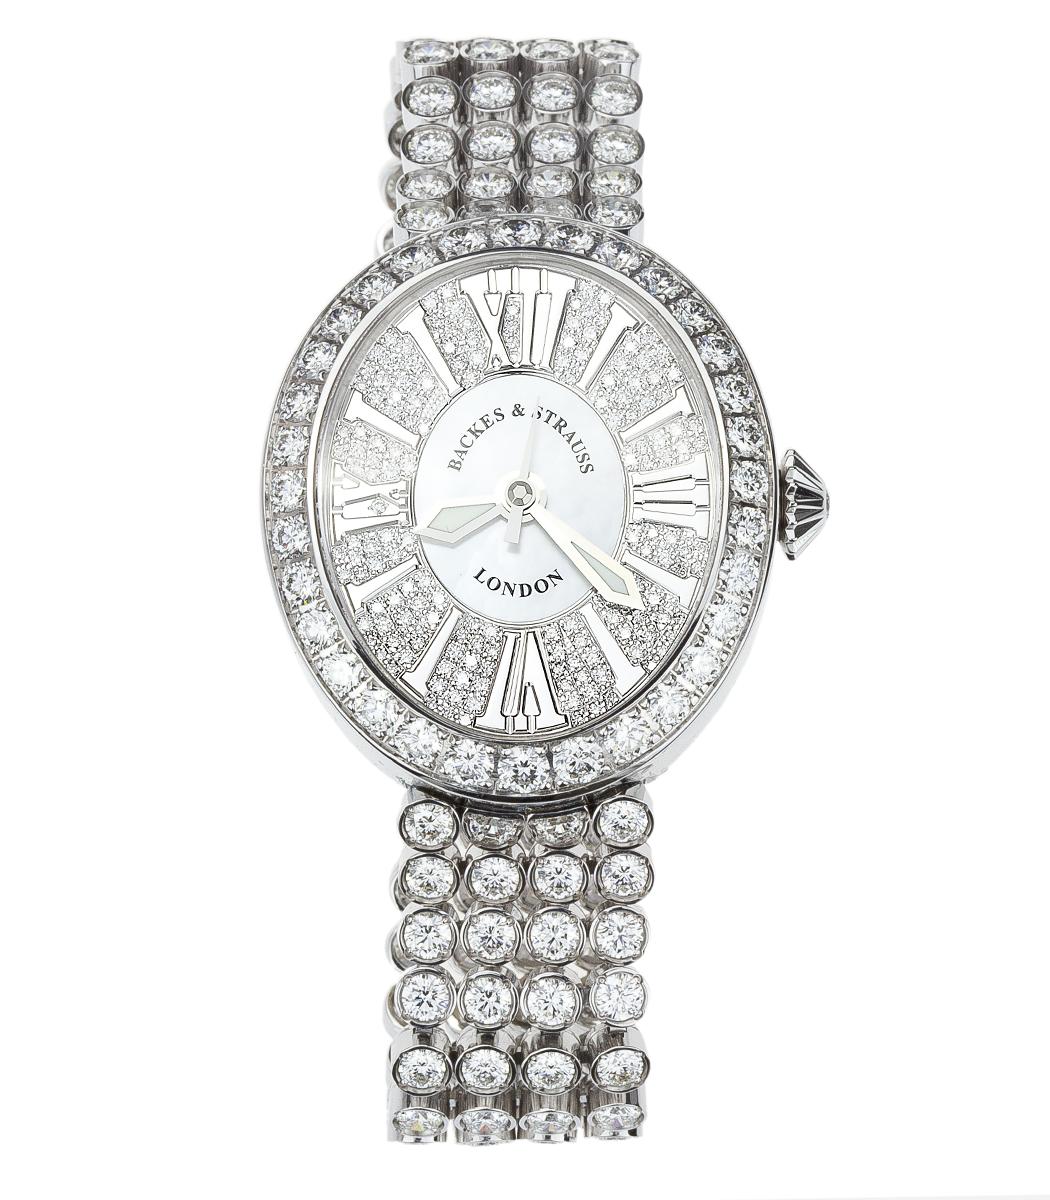 Regent Princess 3238 diamond encrusted watch